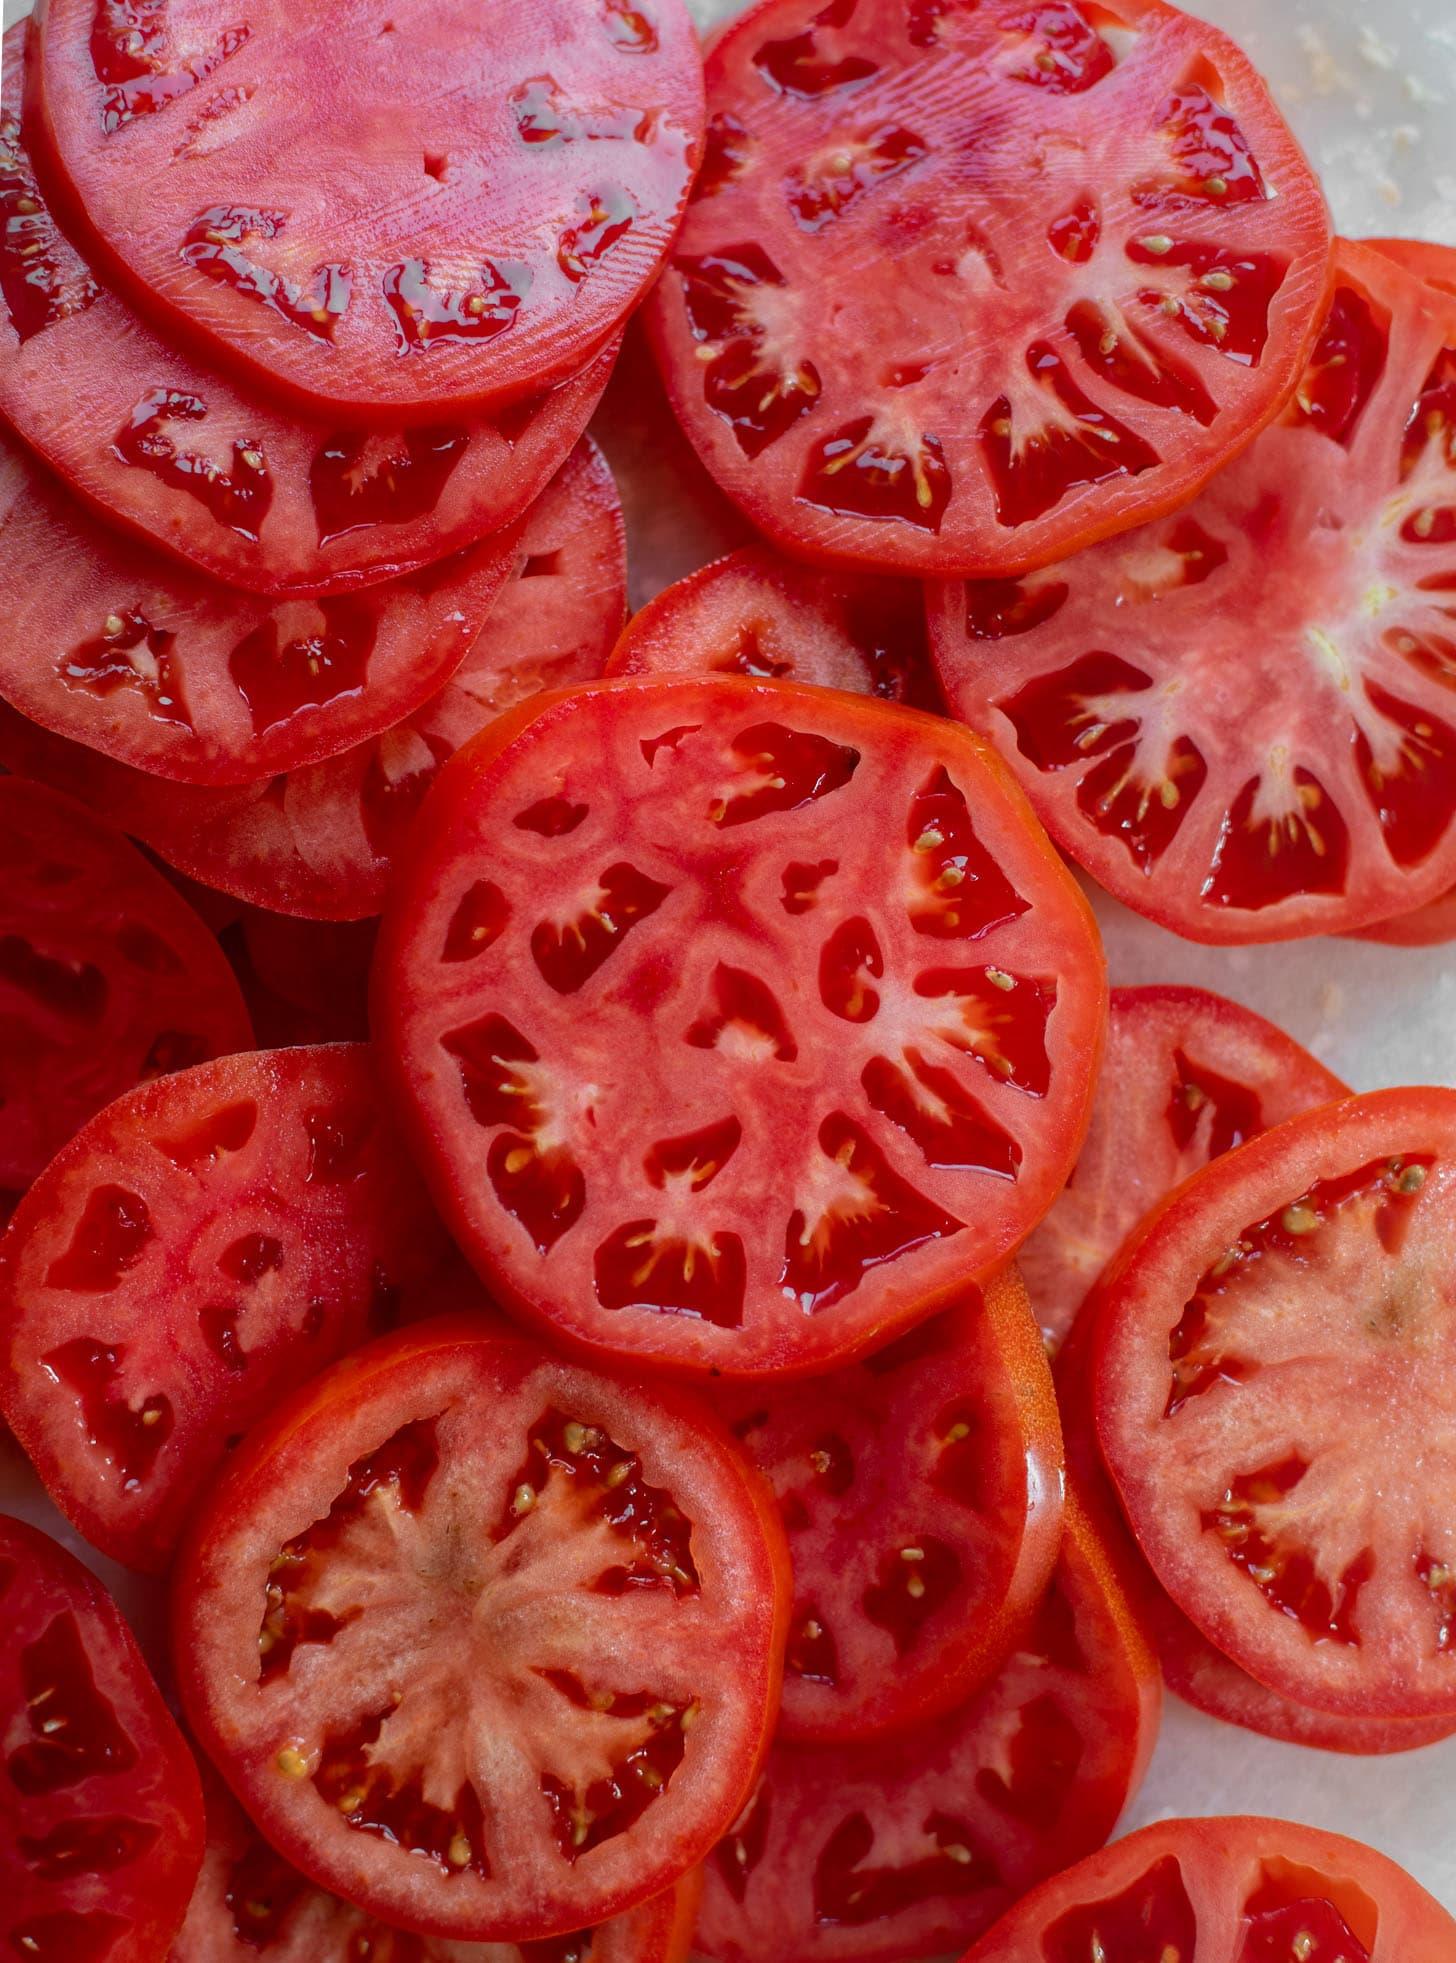 sliced sumemr tomatoes